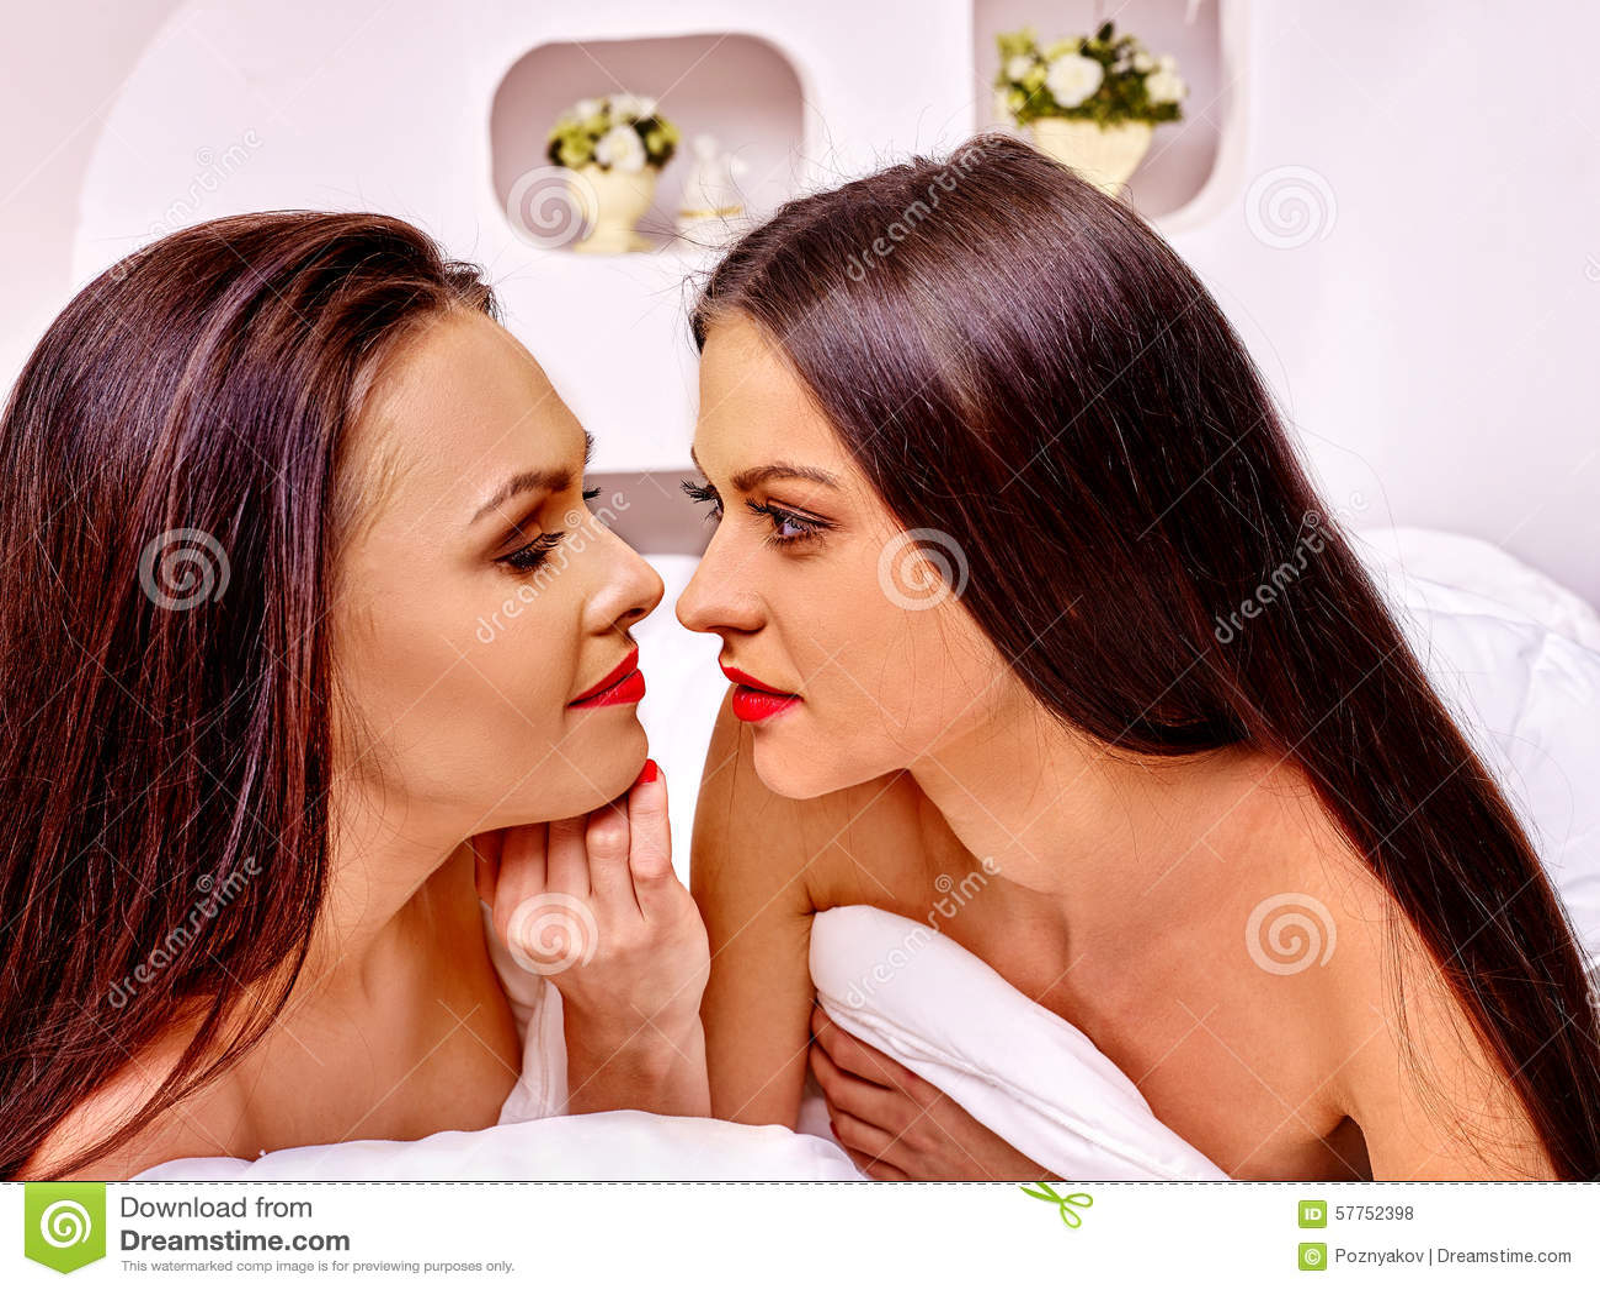 Site theme Beautiful lesbian photo have